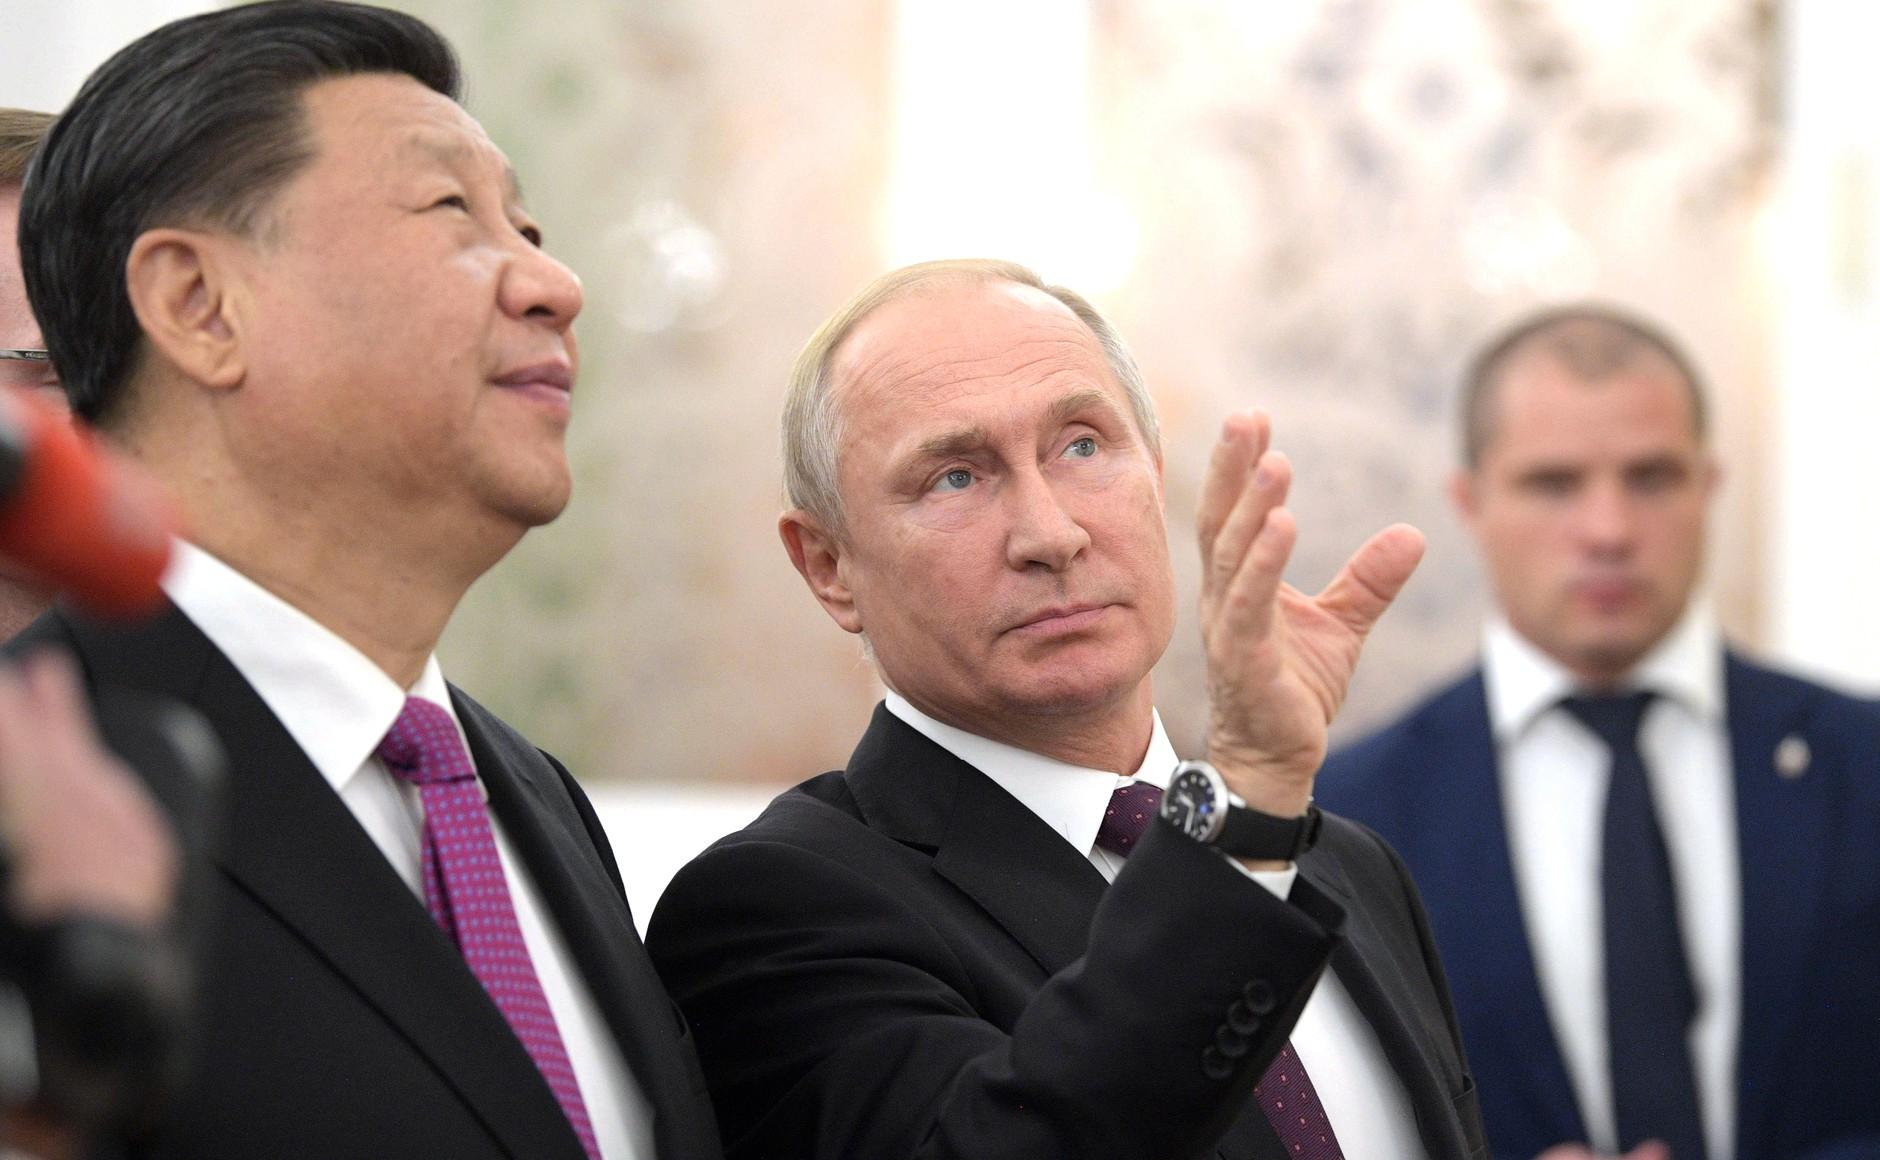 File:Vladimir Putin and Xi Jinping (2019-06-05) 31.jpg - Wikimedia Commons